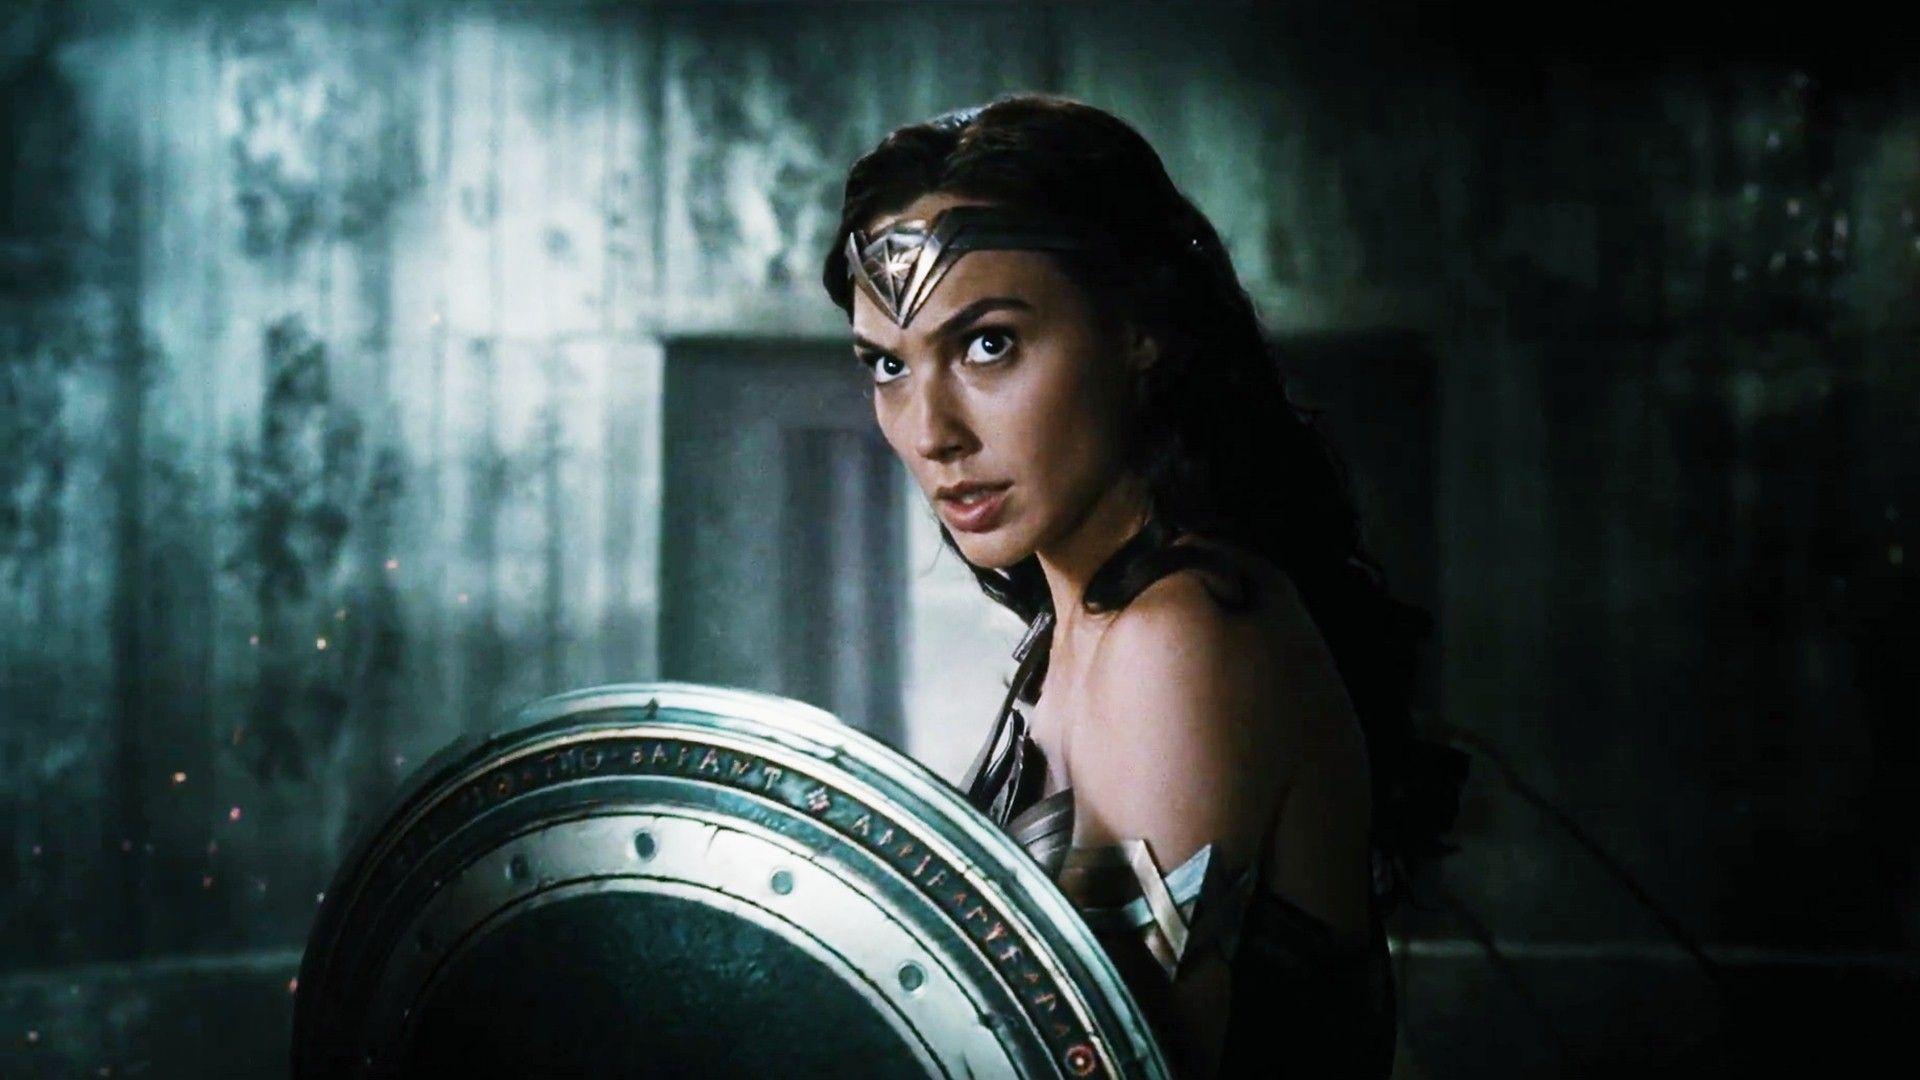 Wonder Woman Movie Wallpapers Wallpaper Cave